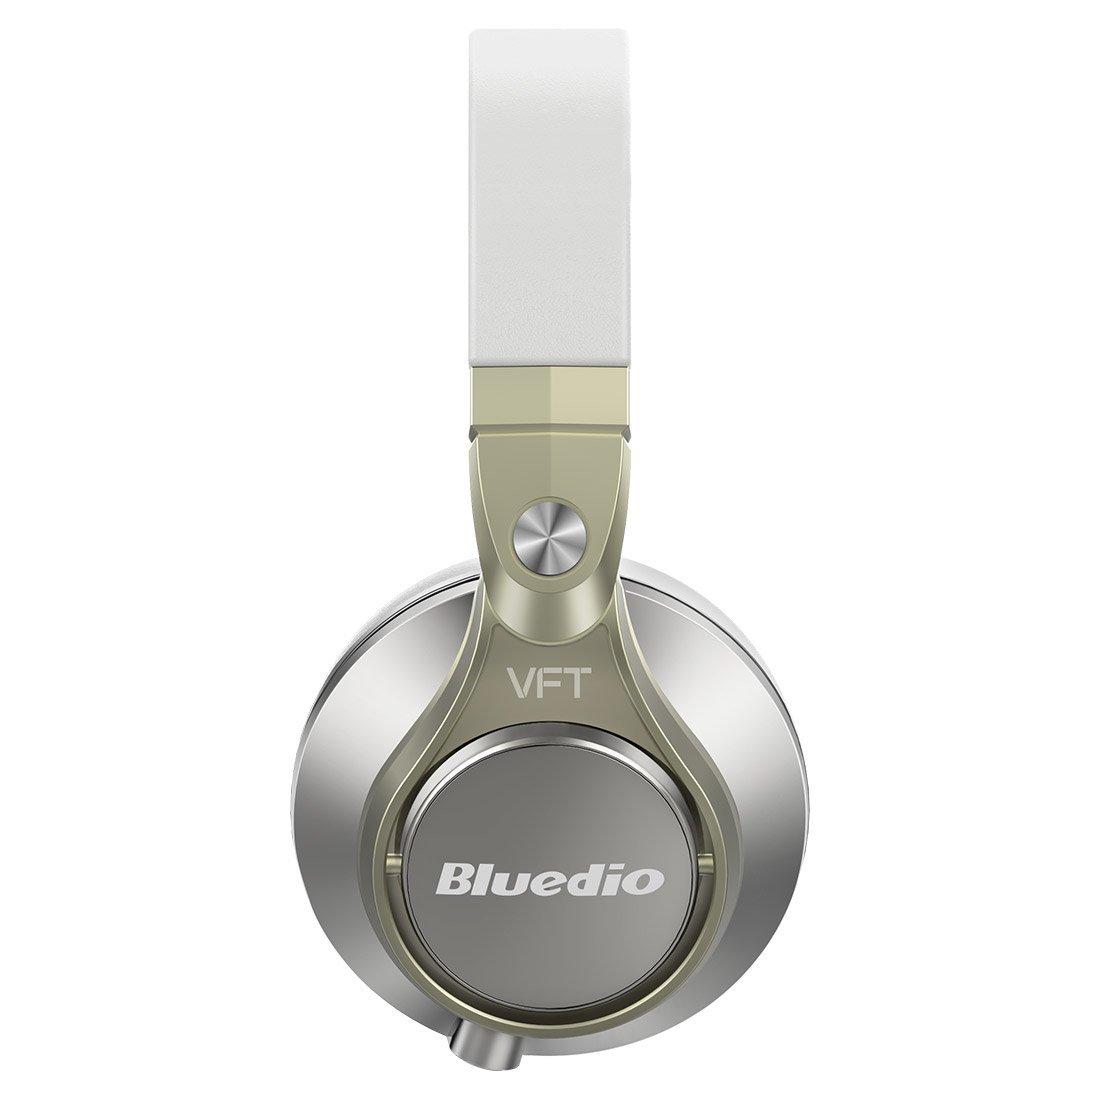 Bluedio Bluetooth Headphones Review Best Dj Headphone Ufo Premium Wireless Headset High End